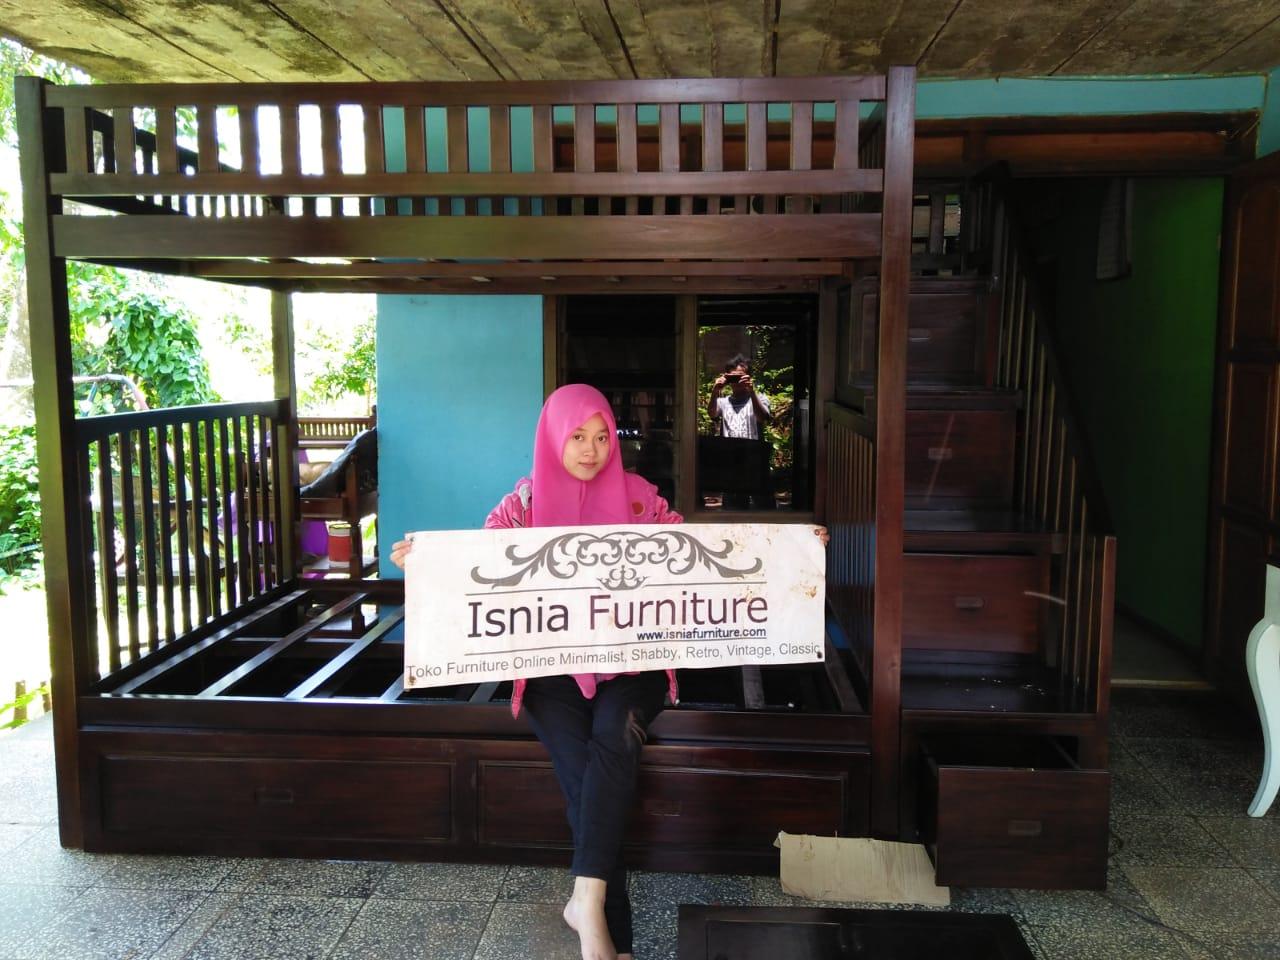 Tempat-Tidur-Tingkat-Jakarta 49 Tempat Tidur Tingkat Kayu Minimalis | JUAL HARGA MURAH